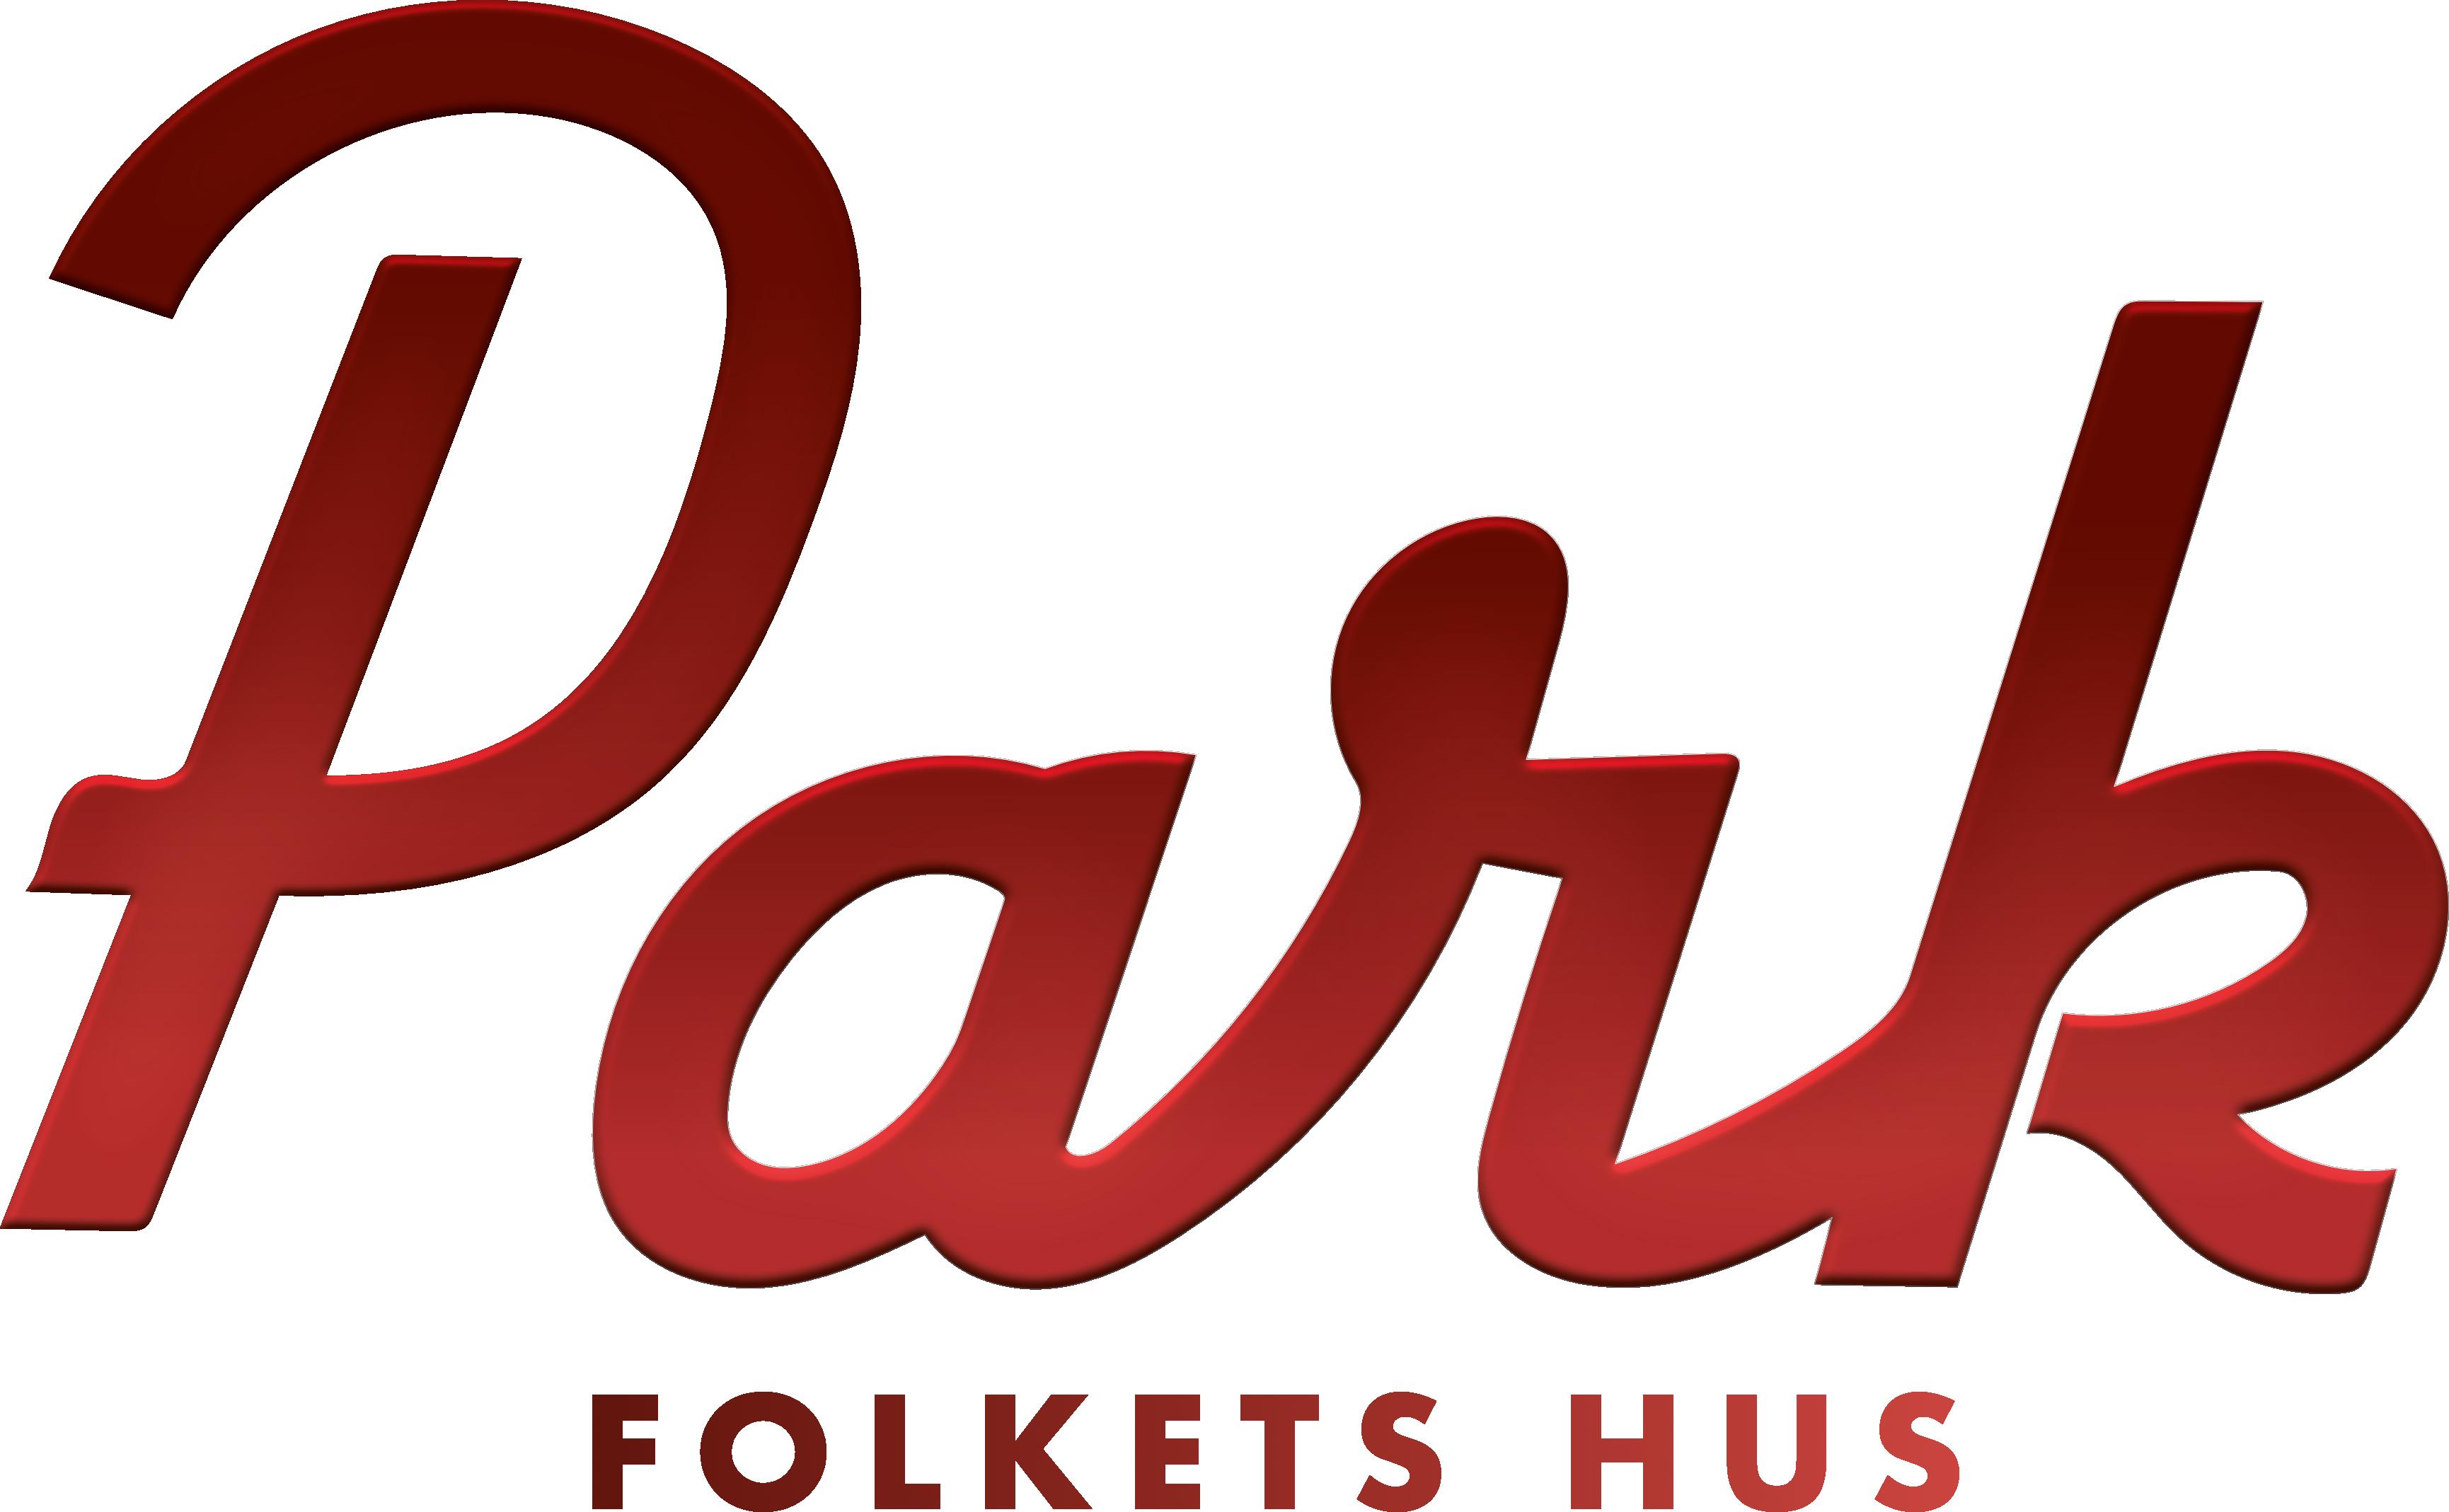 Park folkets hus i Älvjsö